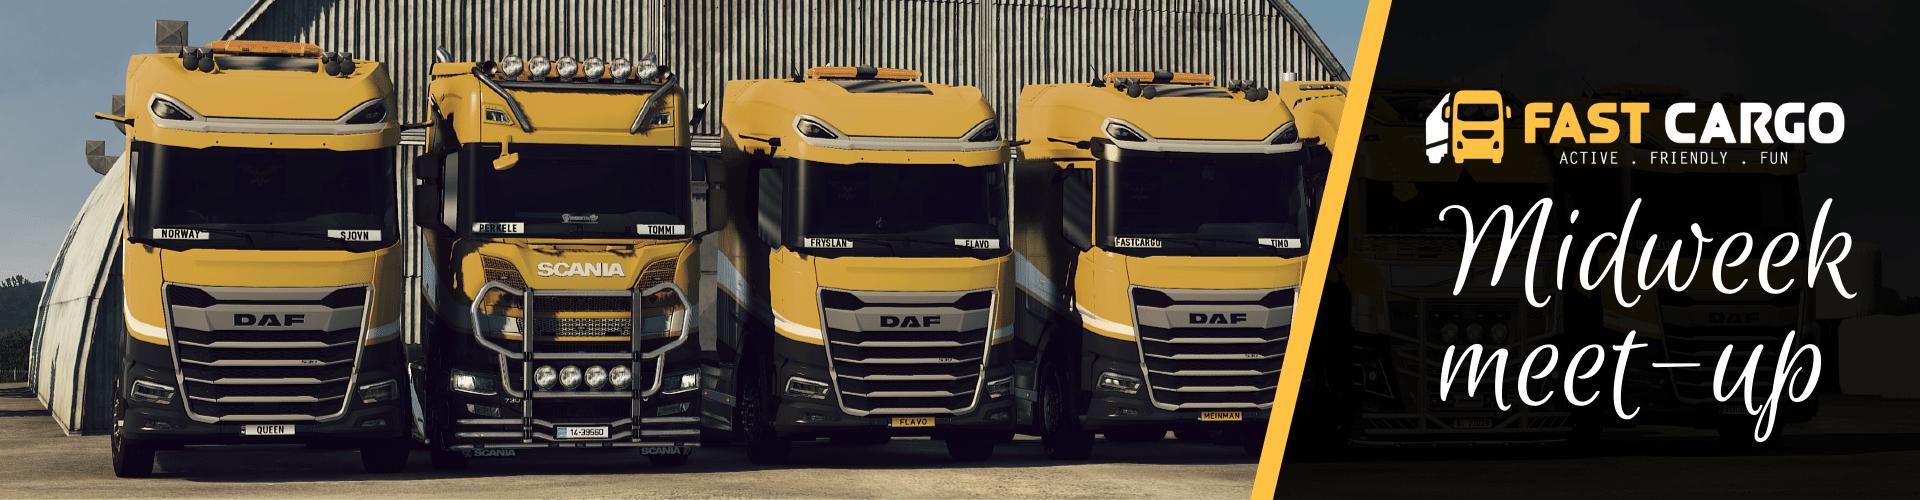 Fast Cargo Midweek meet-up